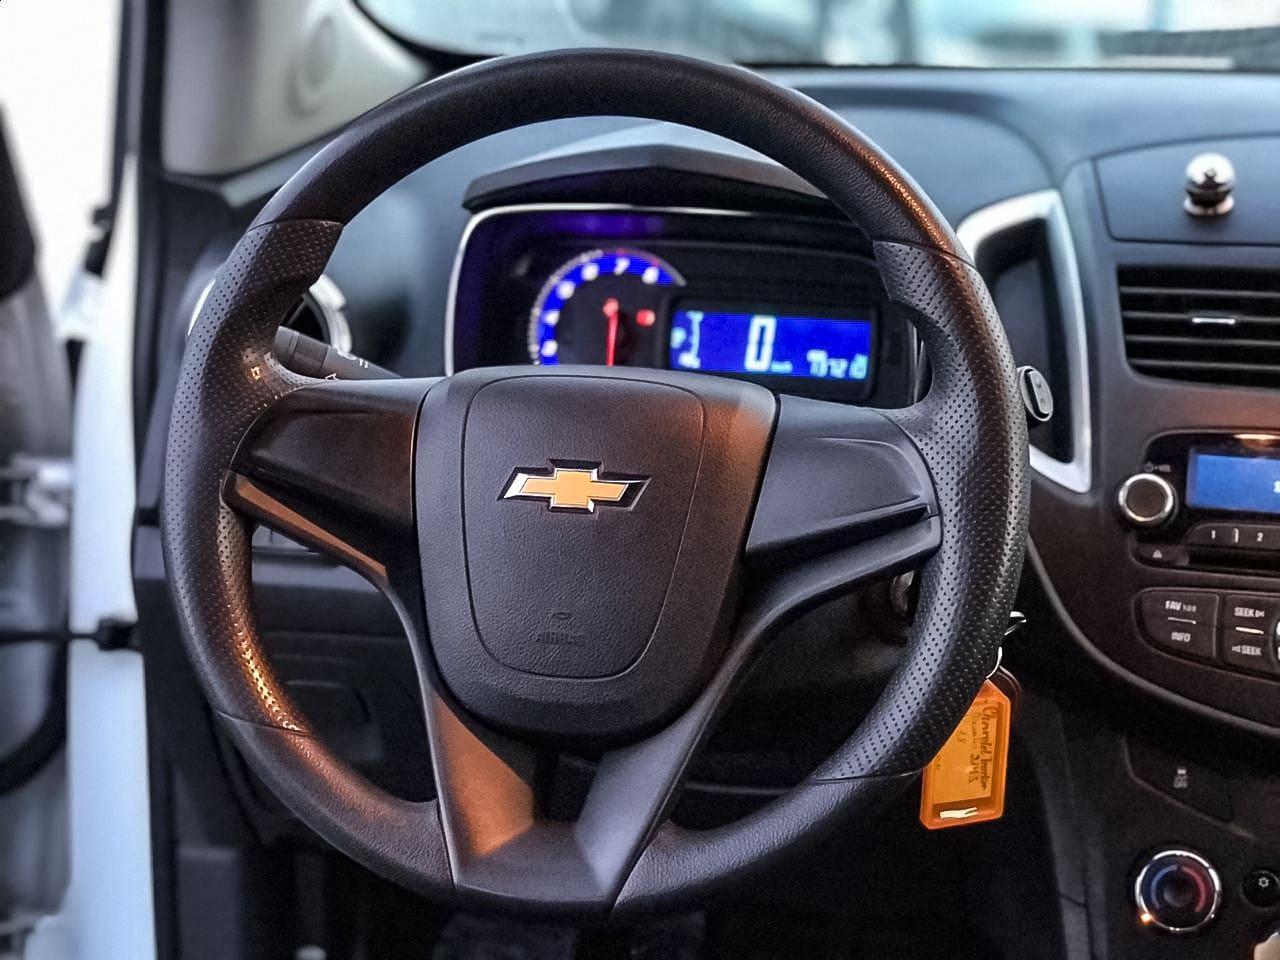 2013 Chevrolet TRACKER | Vin: KL1BF765JDB169710